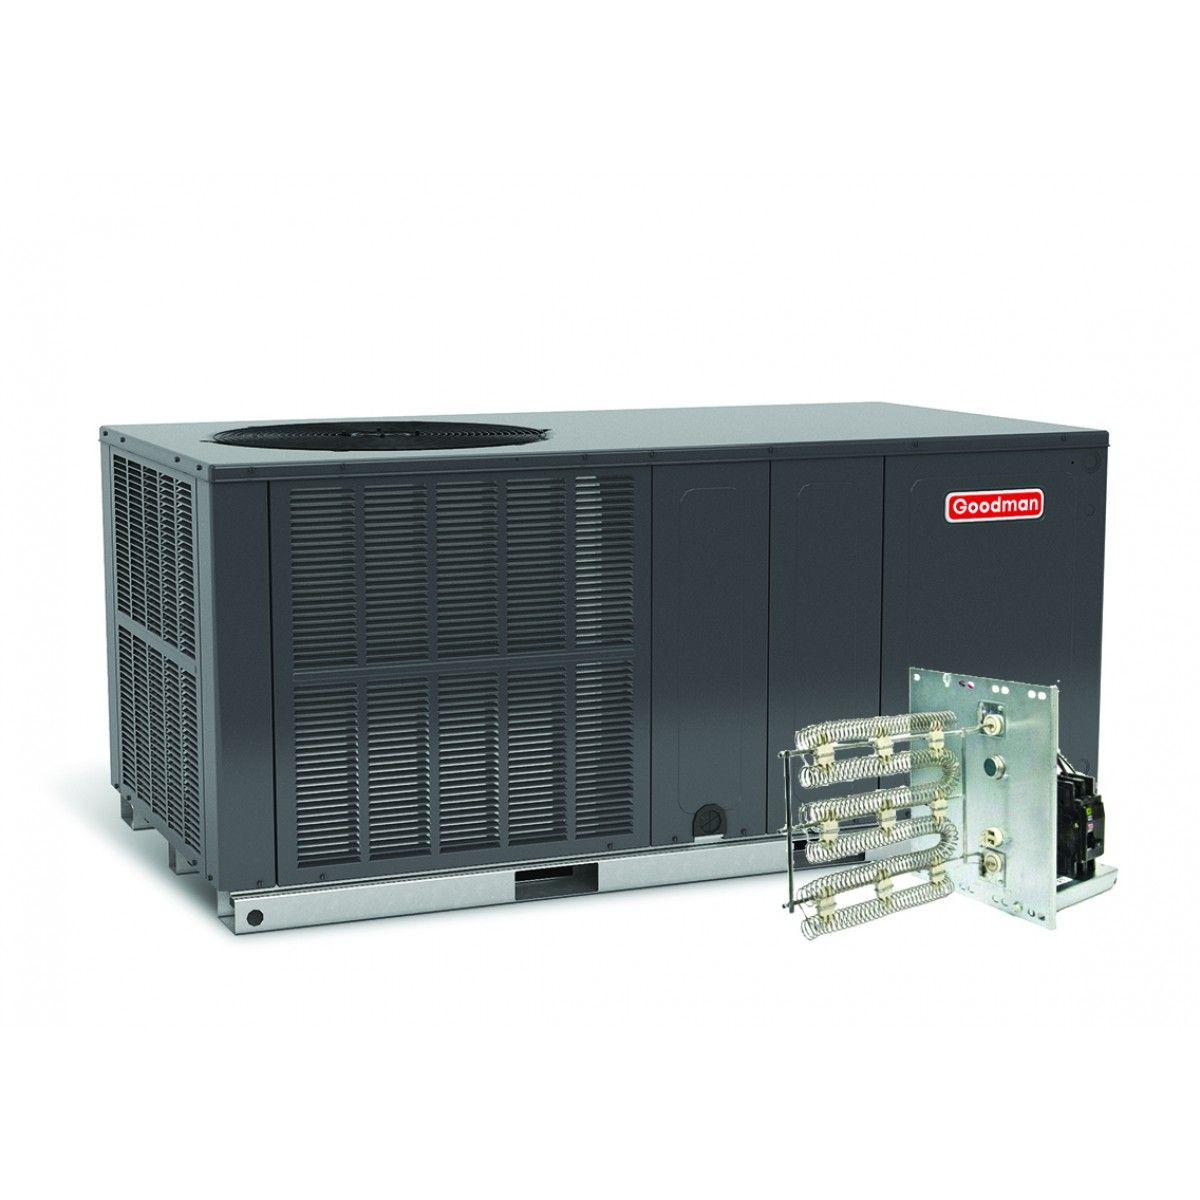 Goodman 5 Ton 14 Seer Heat Pump Package Unit Horizontal